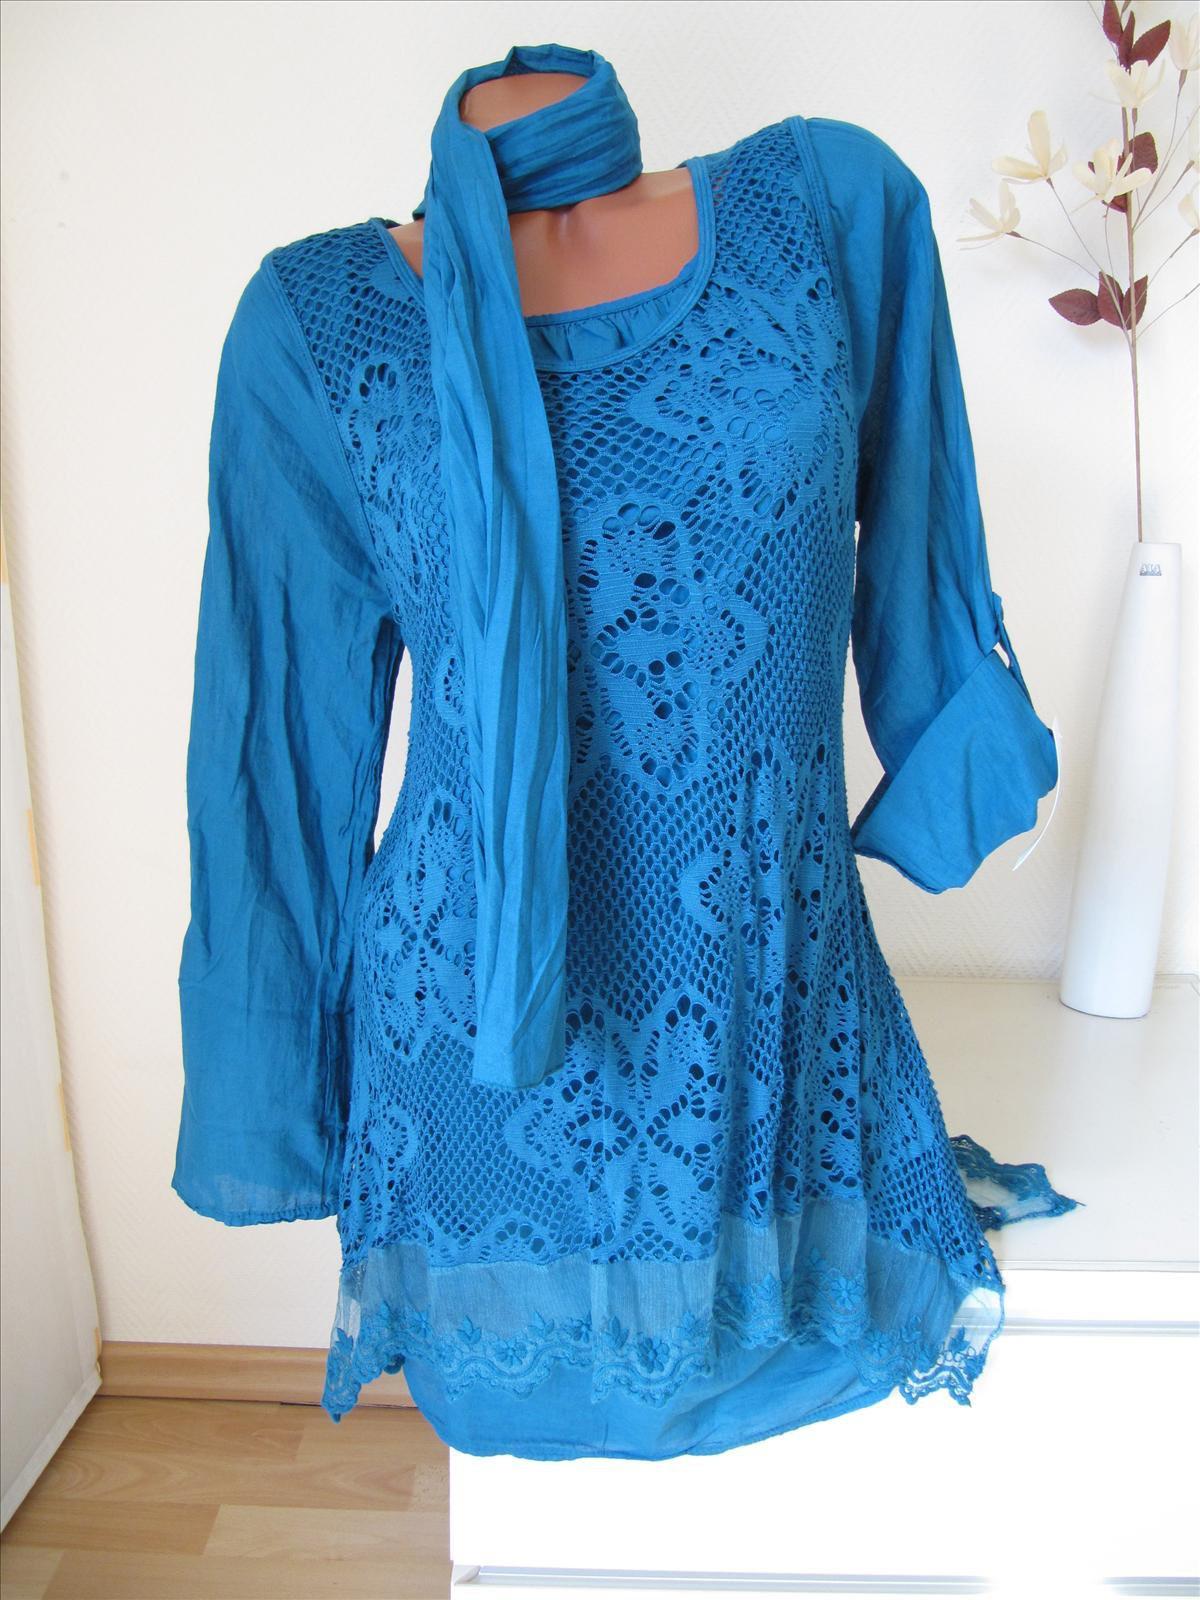 Zipfel Tunika Kleid Spitze Volant Unterkleid Bluse Schal